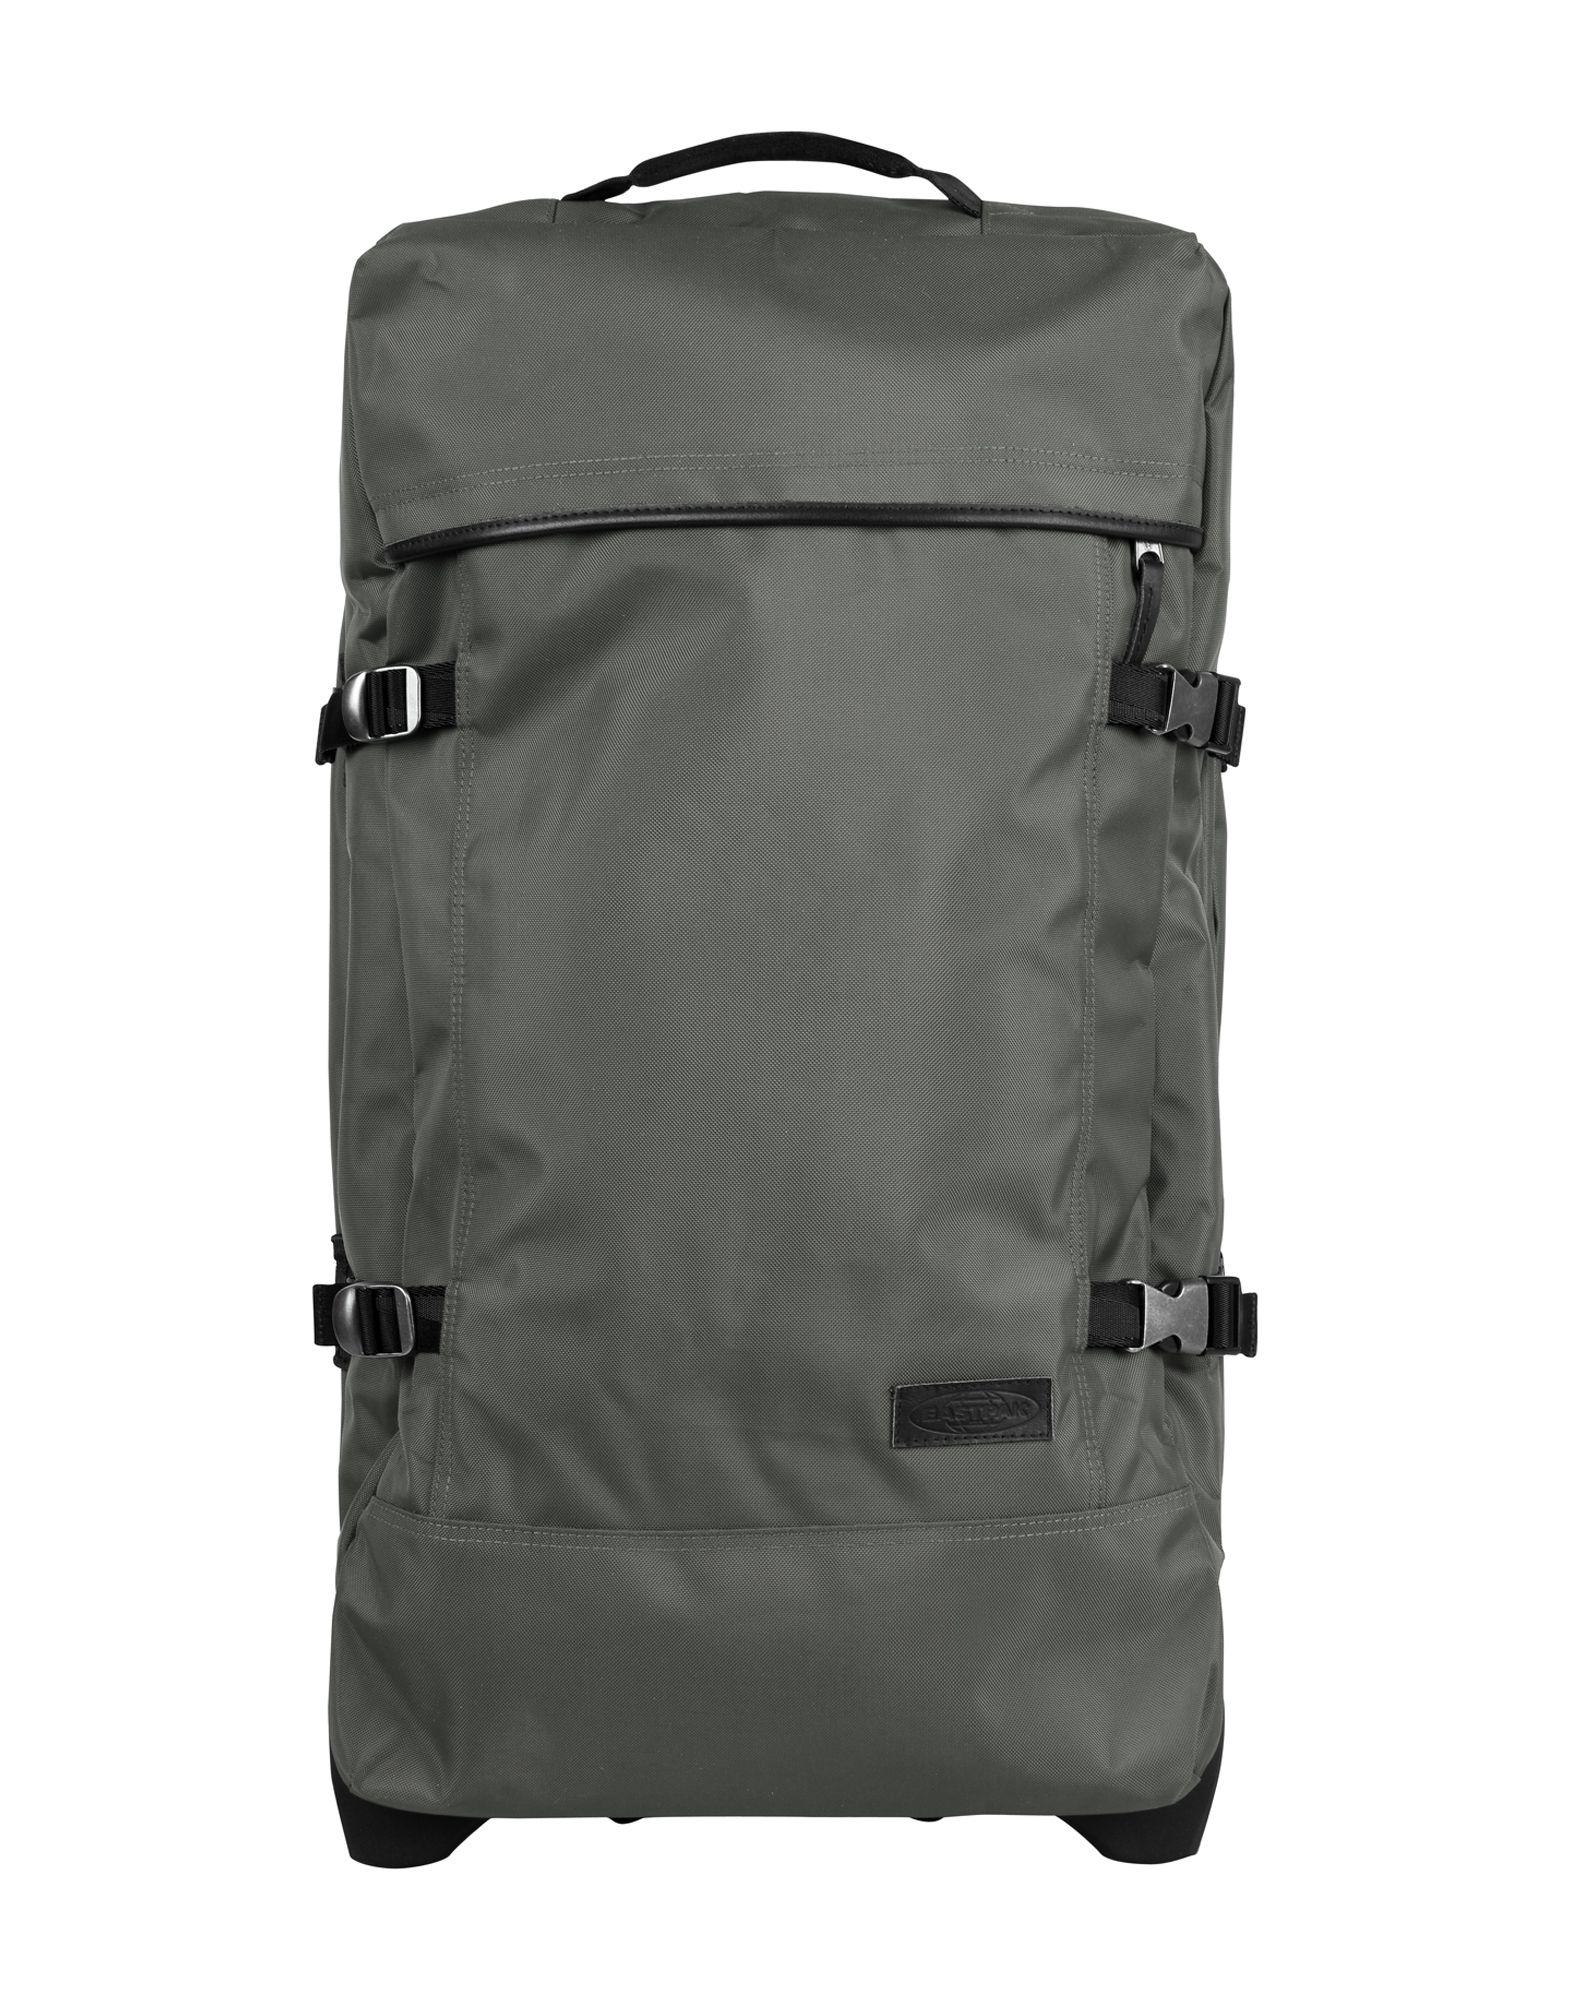 EASTPAK Чемодан/сумка на колесиках чемодан средний m sunvoyage voyage sv015 ac023 24